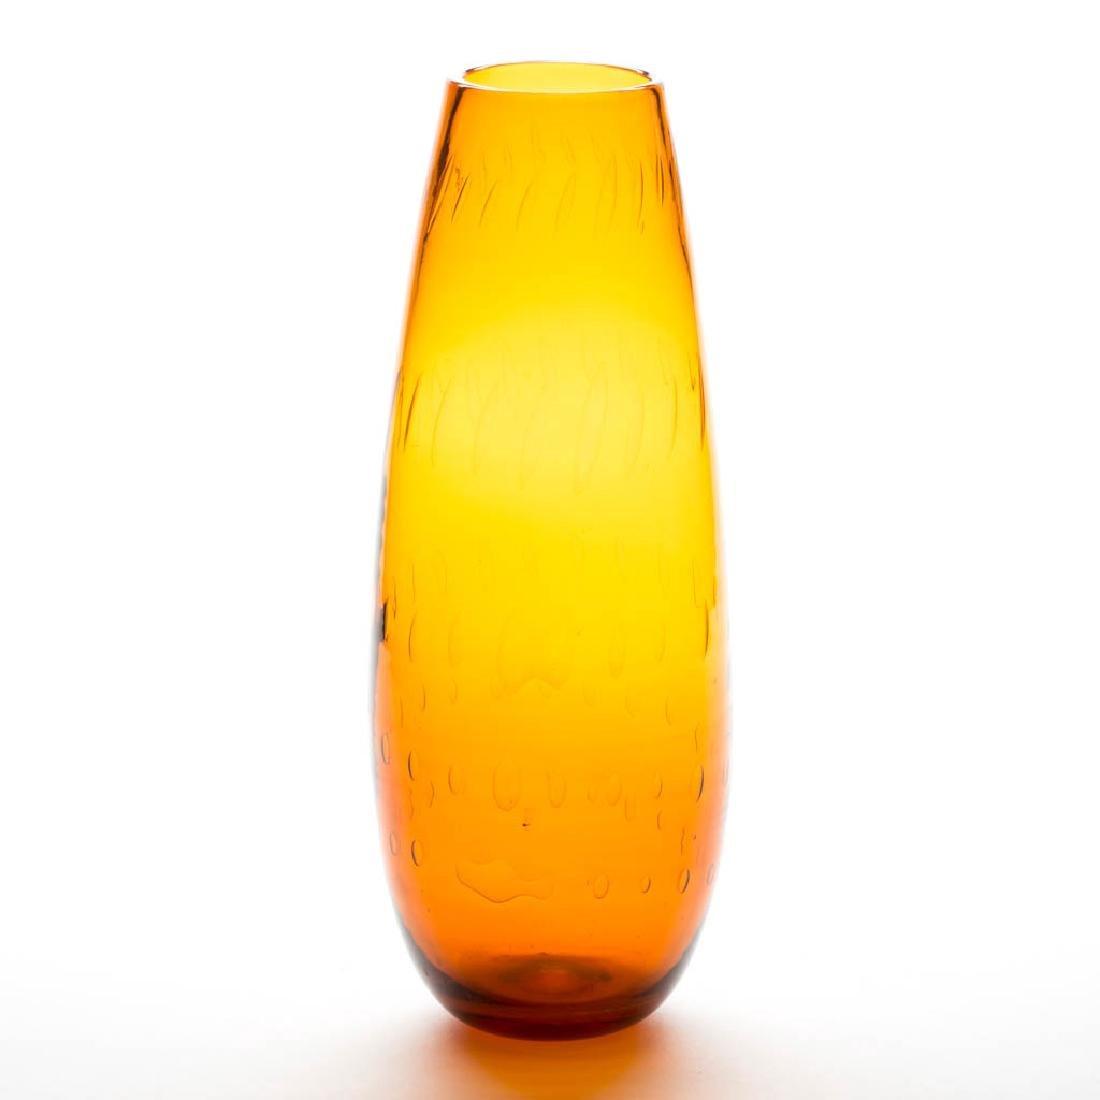 BLENKO AIR-TRAP GLASS VASE